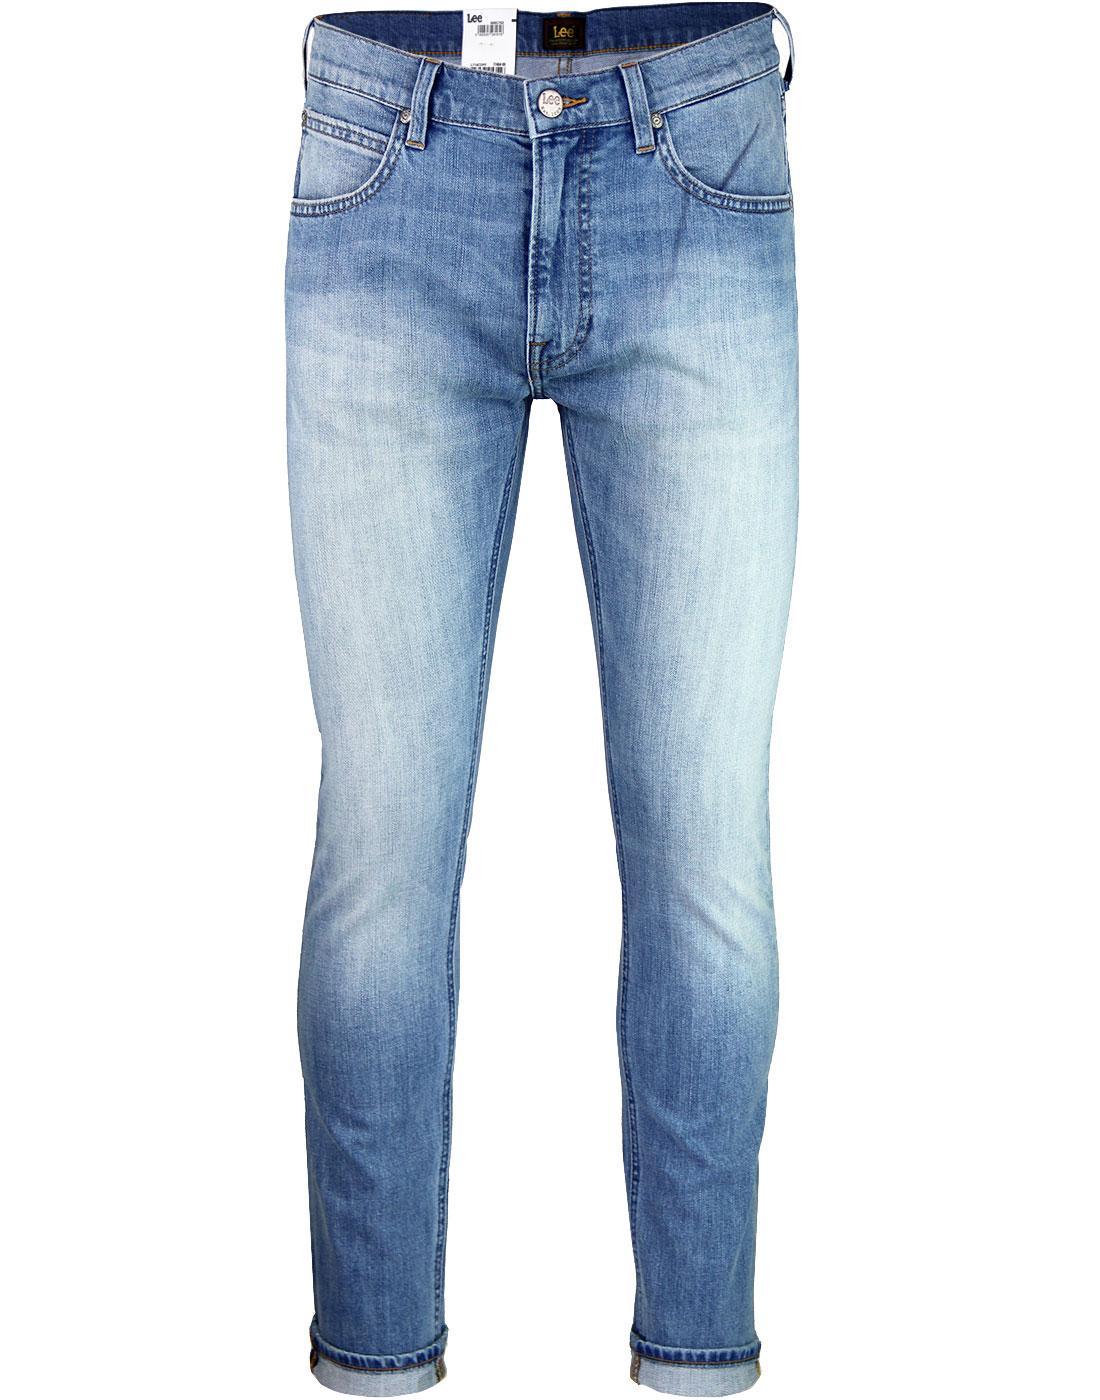 Luke LEE Slim Tapered Retro Denim Jeans KICK IT